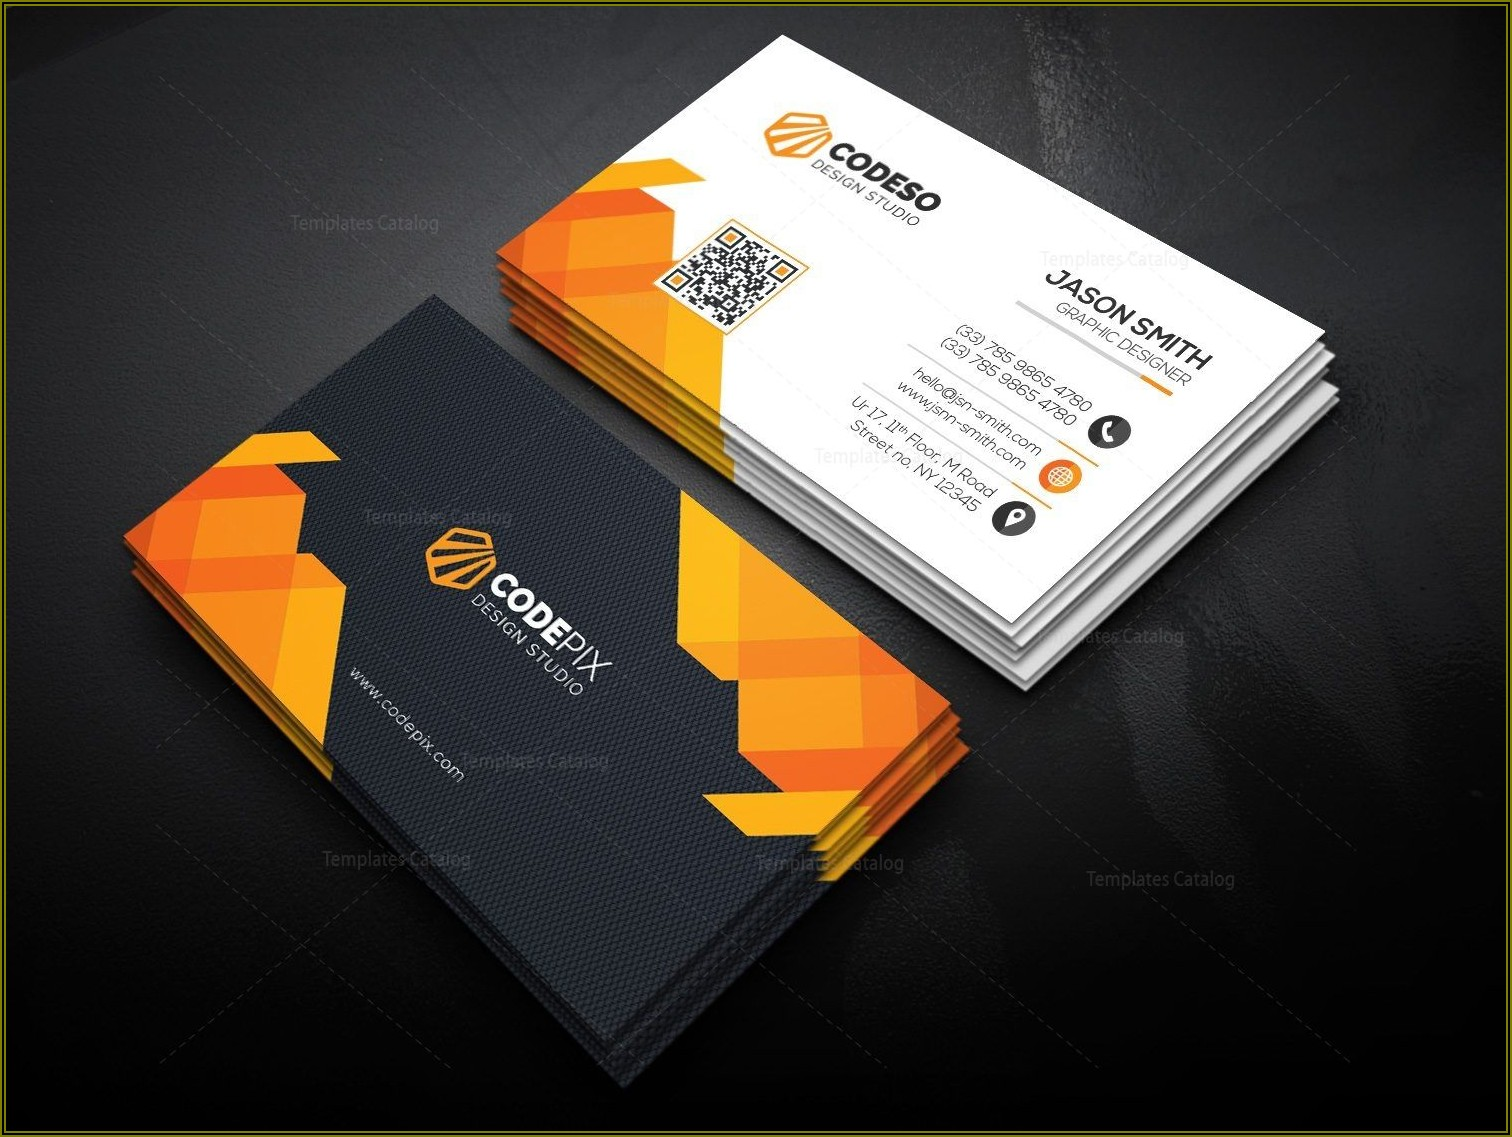 Delta Business Card Vs Personal